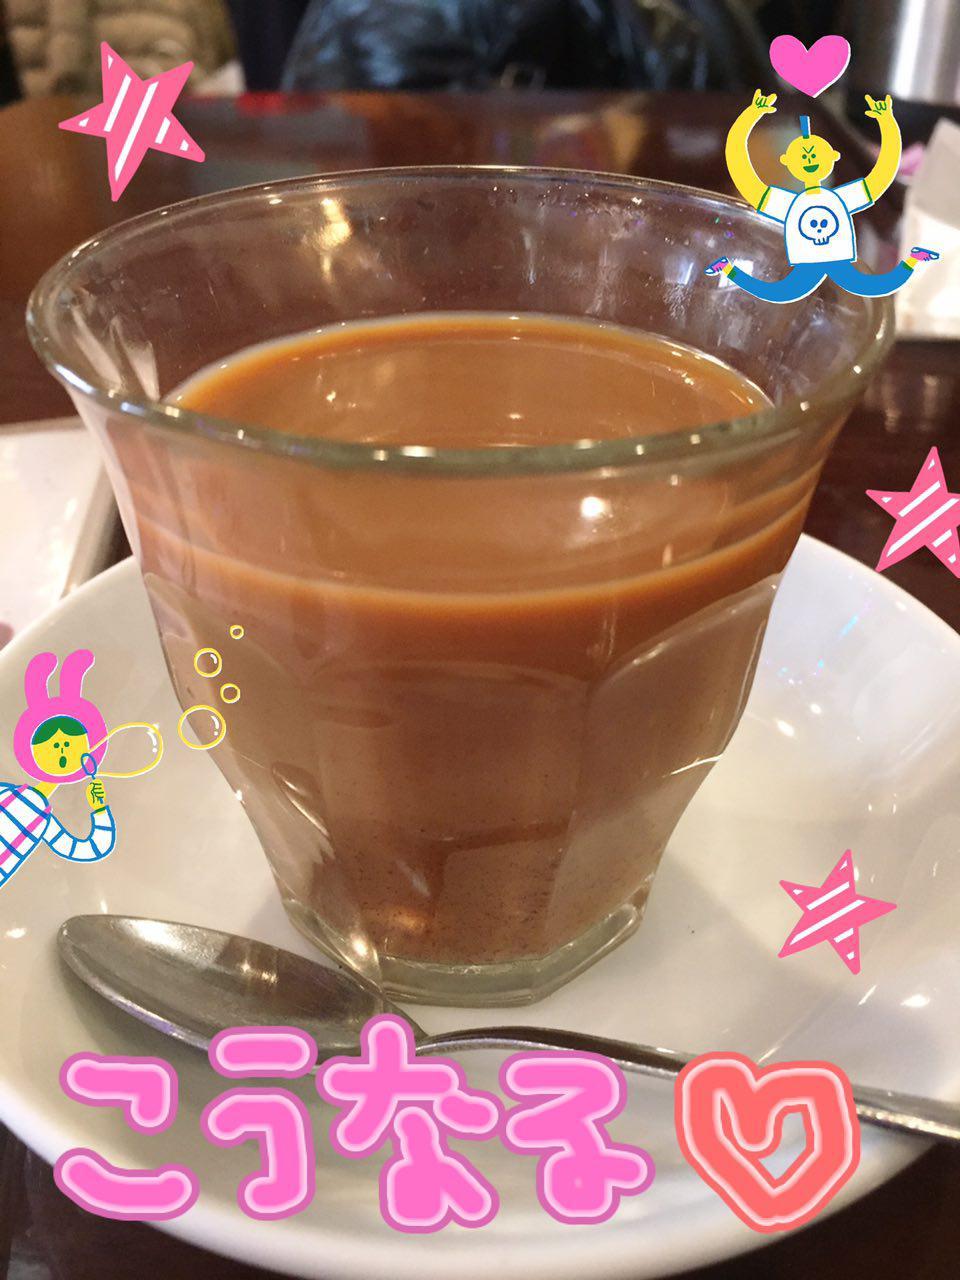 photo_2017-01-30_00-11-12.jpg